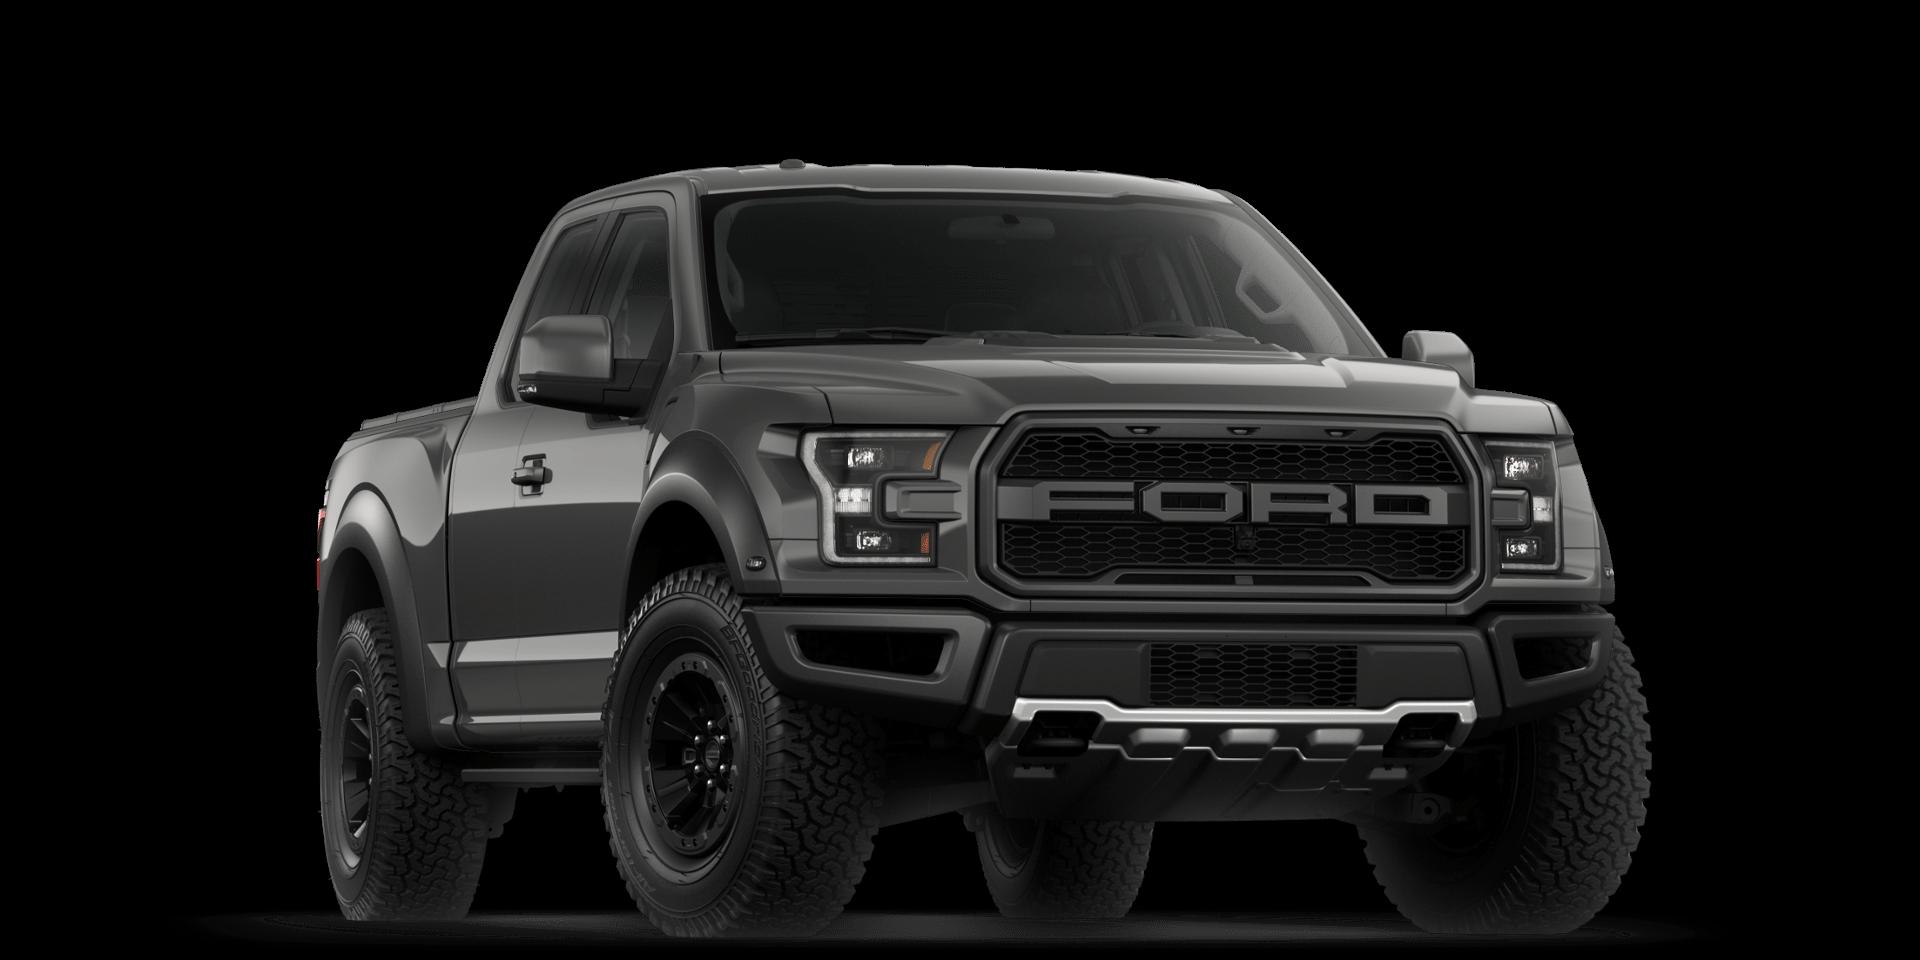 2017 Ford F150 Build & Price Ford f150, Hybrid car, Ford